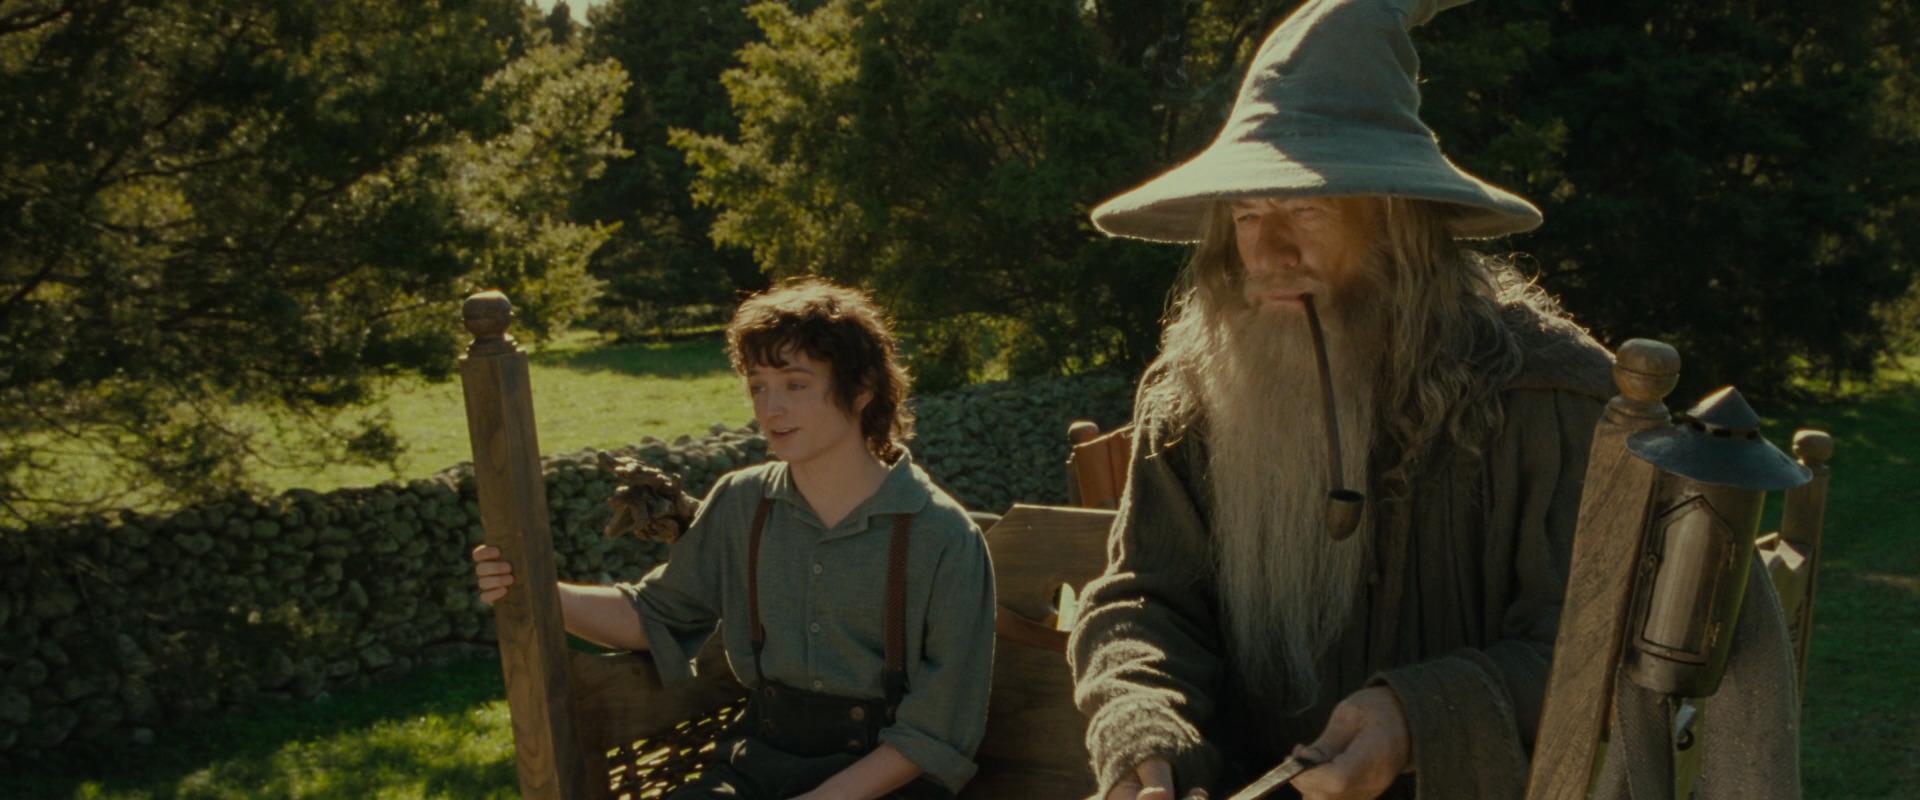 LOTR - Fellowship of the Ring - Screencap Thingie - Page 13 Lotr1-movie-screencaps.com-1170